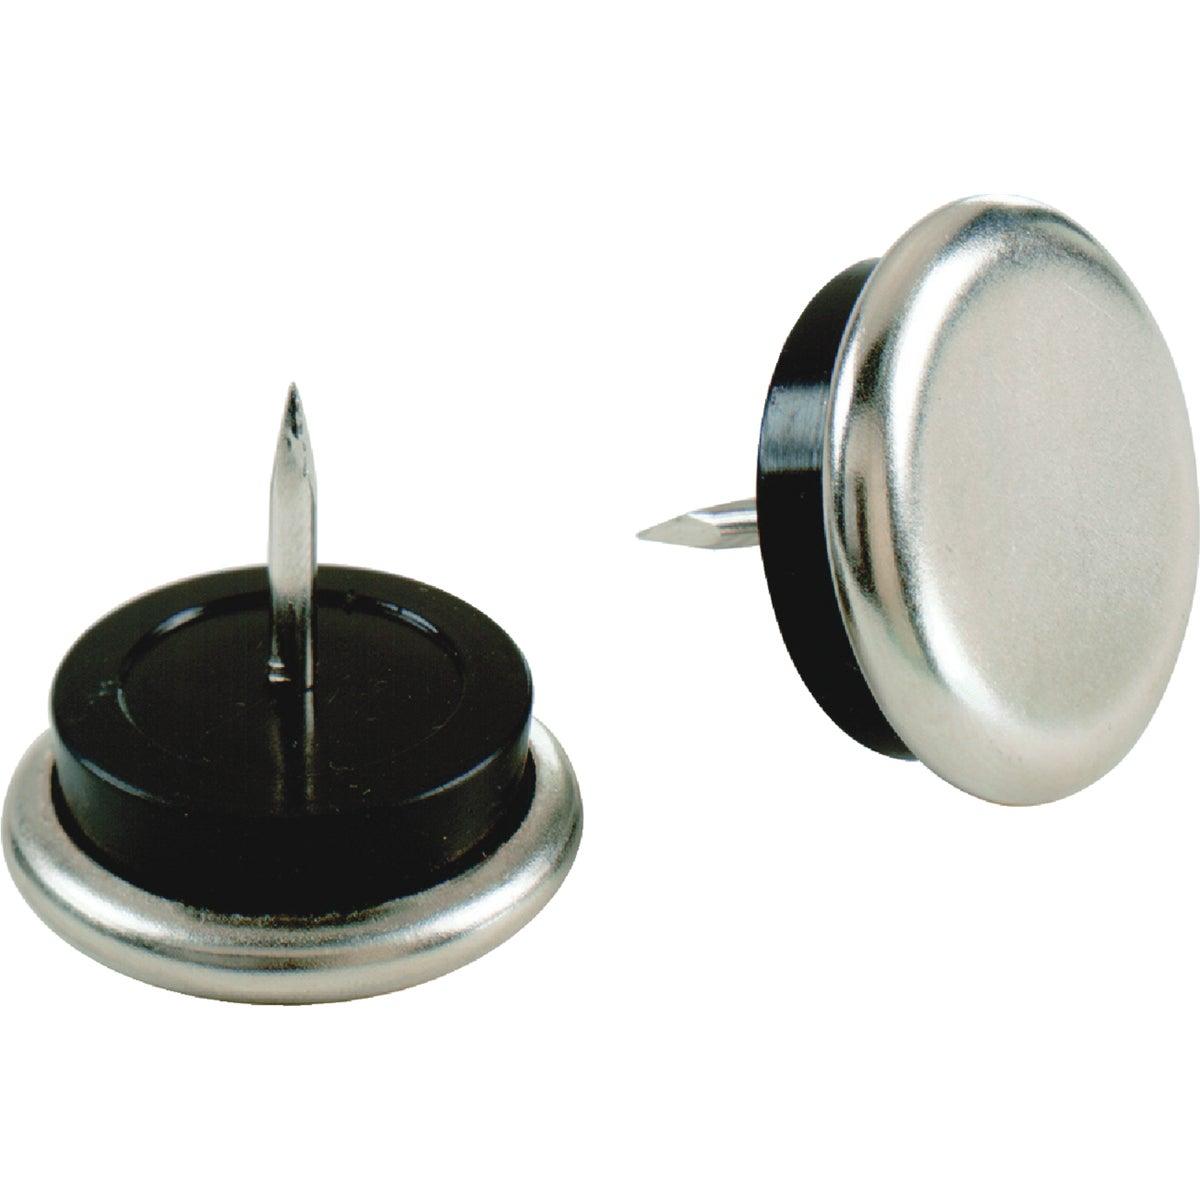 "7/8"" NAIL MTL CUSH GLIDE - 210234 by Shepherd Hardware"